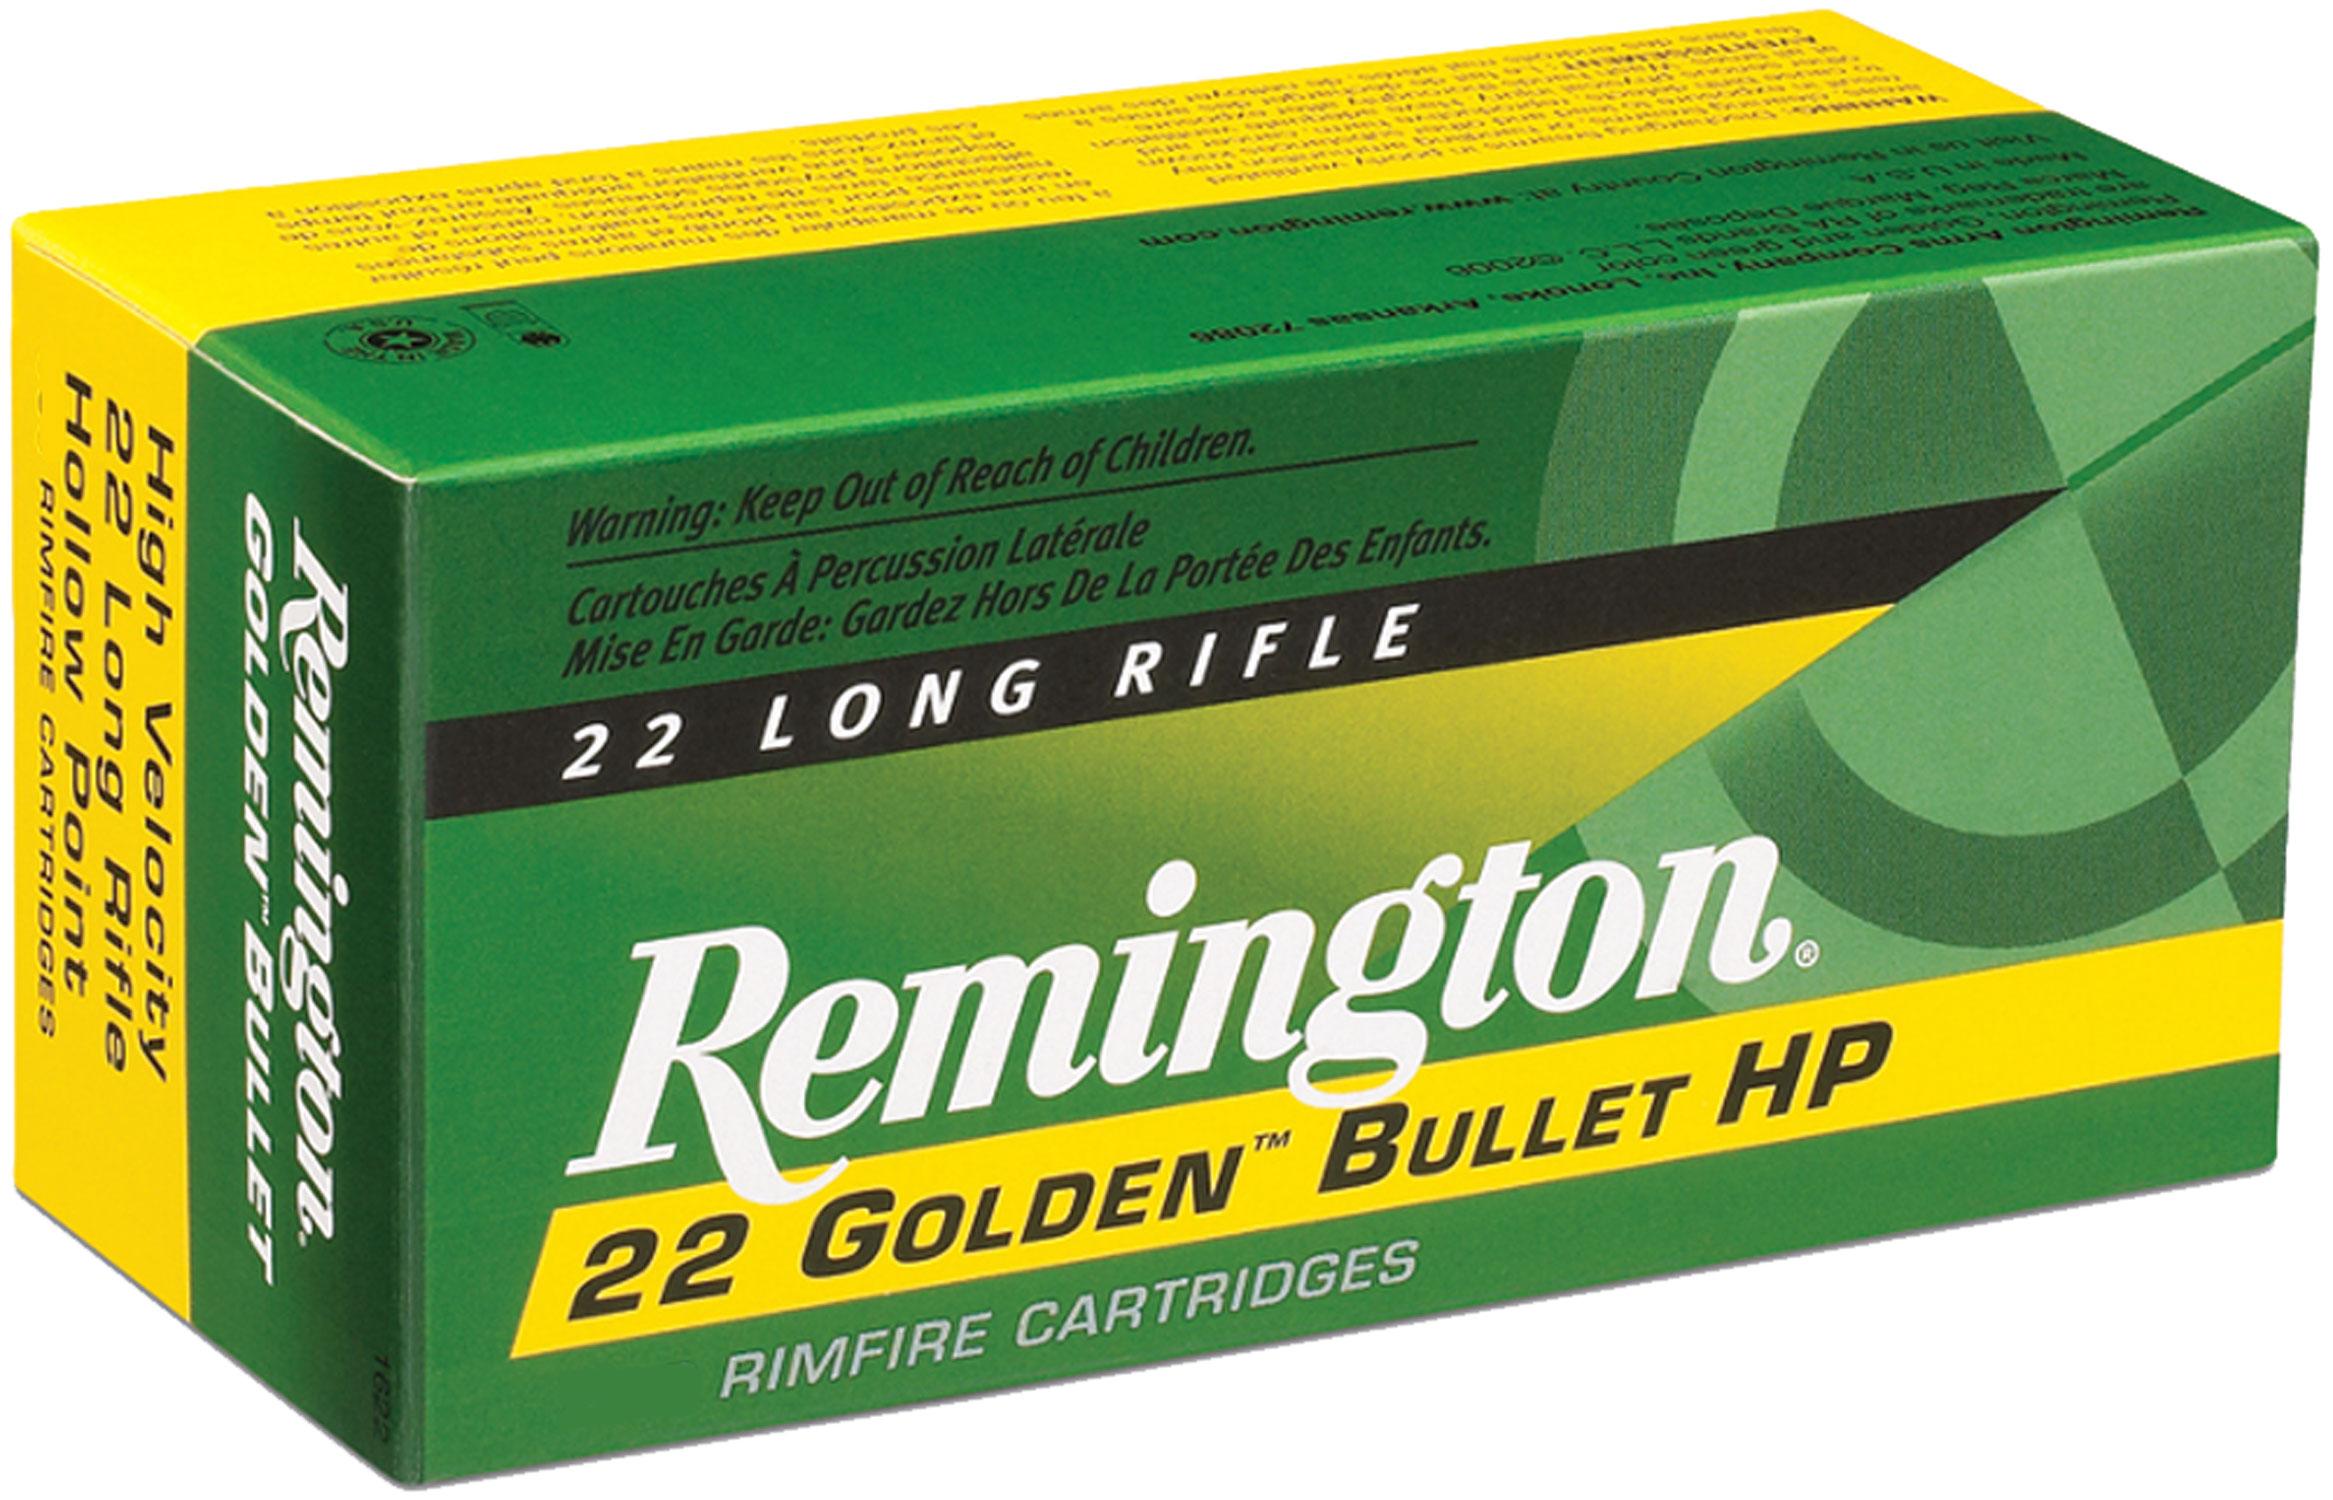 Remington Ammunition 21229 Golden Bullet High Velocity  22 Long Rifle (LR) 36 GR Plated Hollow Point 225 Bx/ 10 Cs